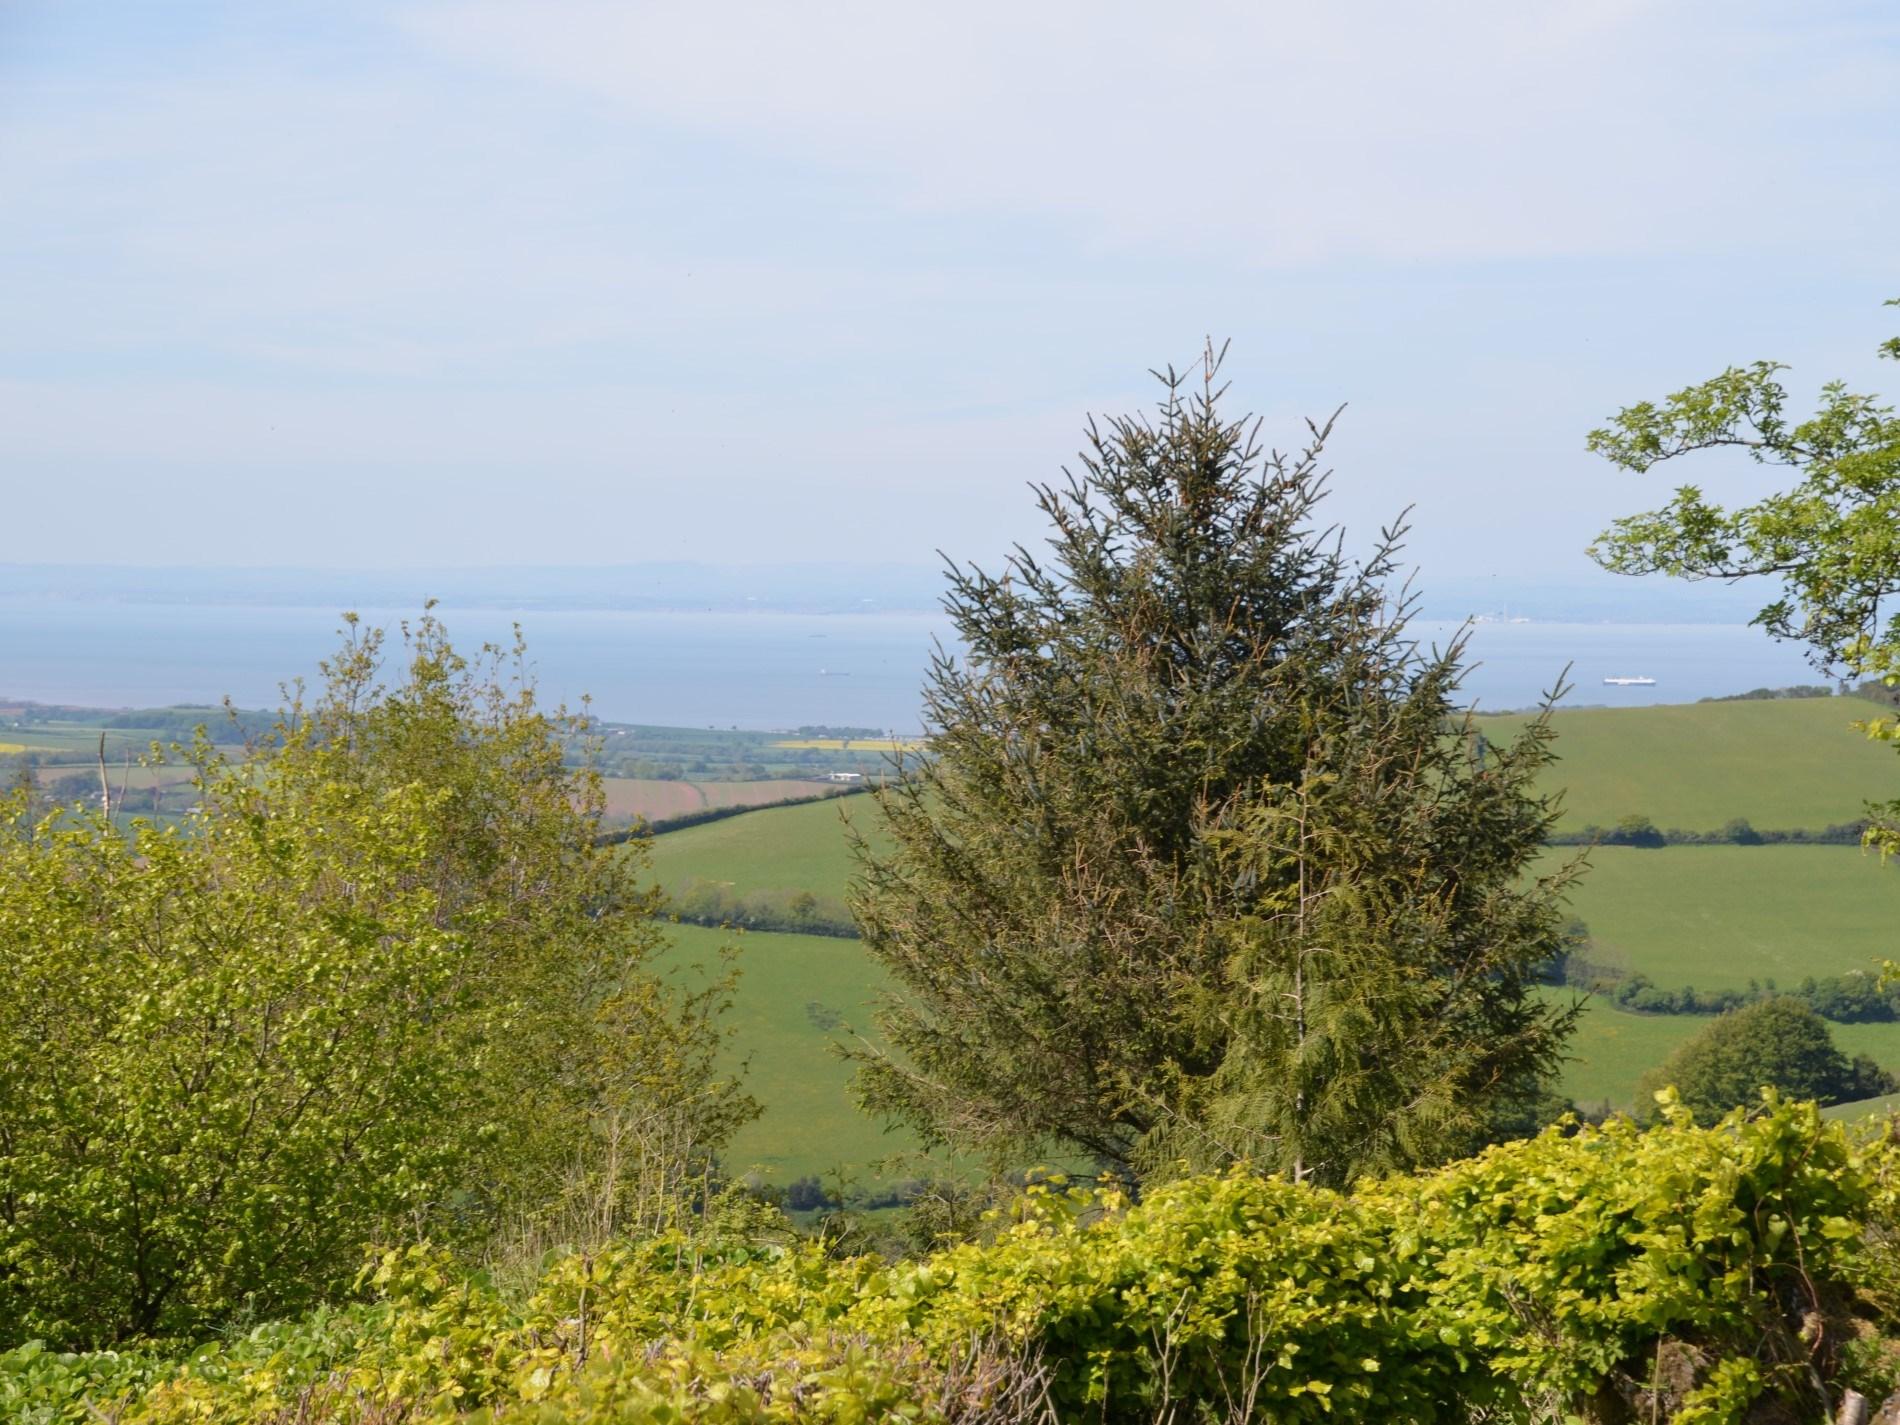 Looking across towards the Somerset coast from Exmoor National Park